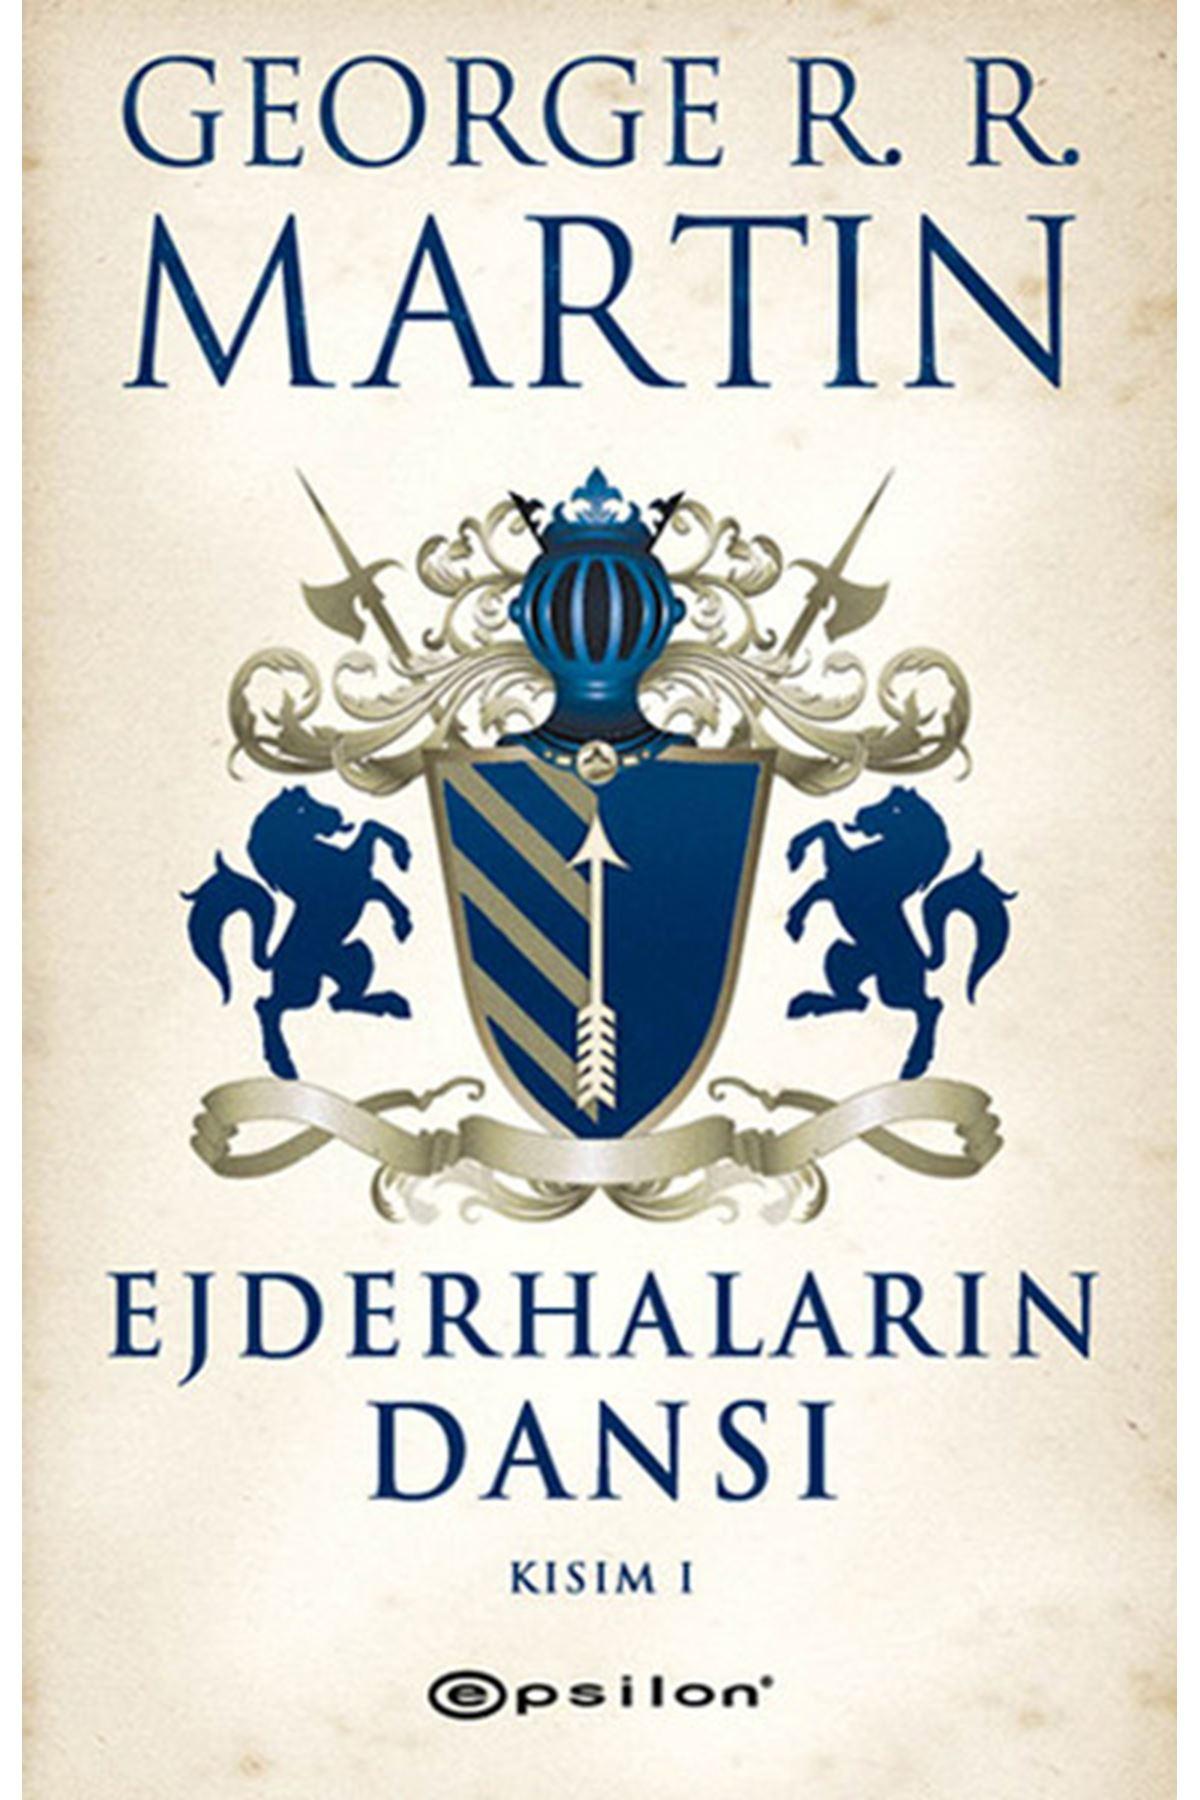 GEORGE R. R. MARTIN - EJDERHALARIN DANSI KISIM 1